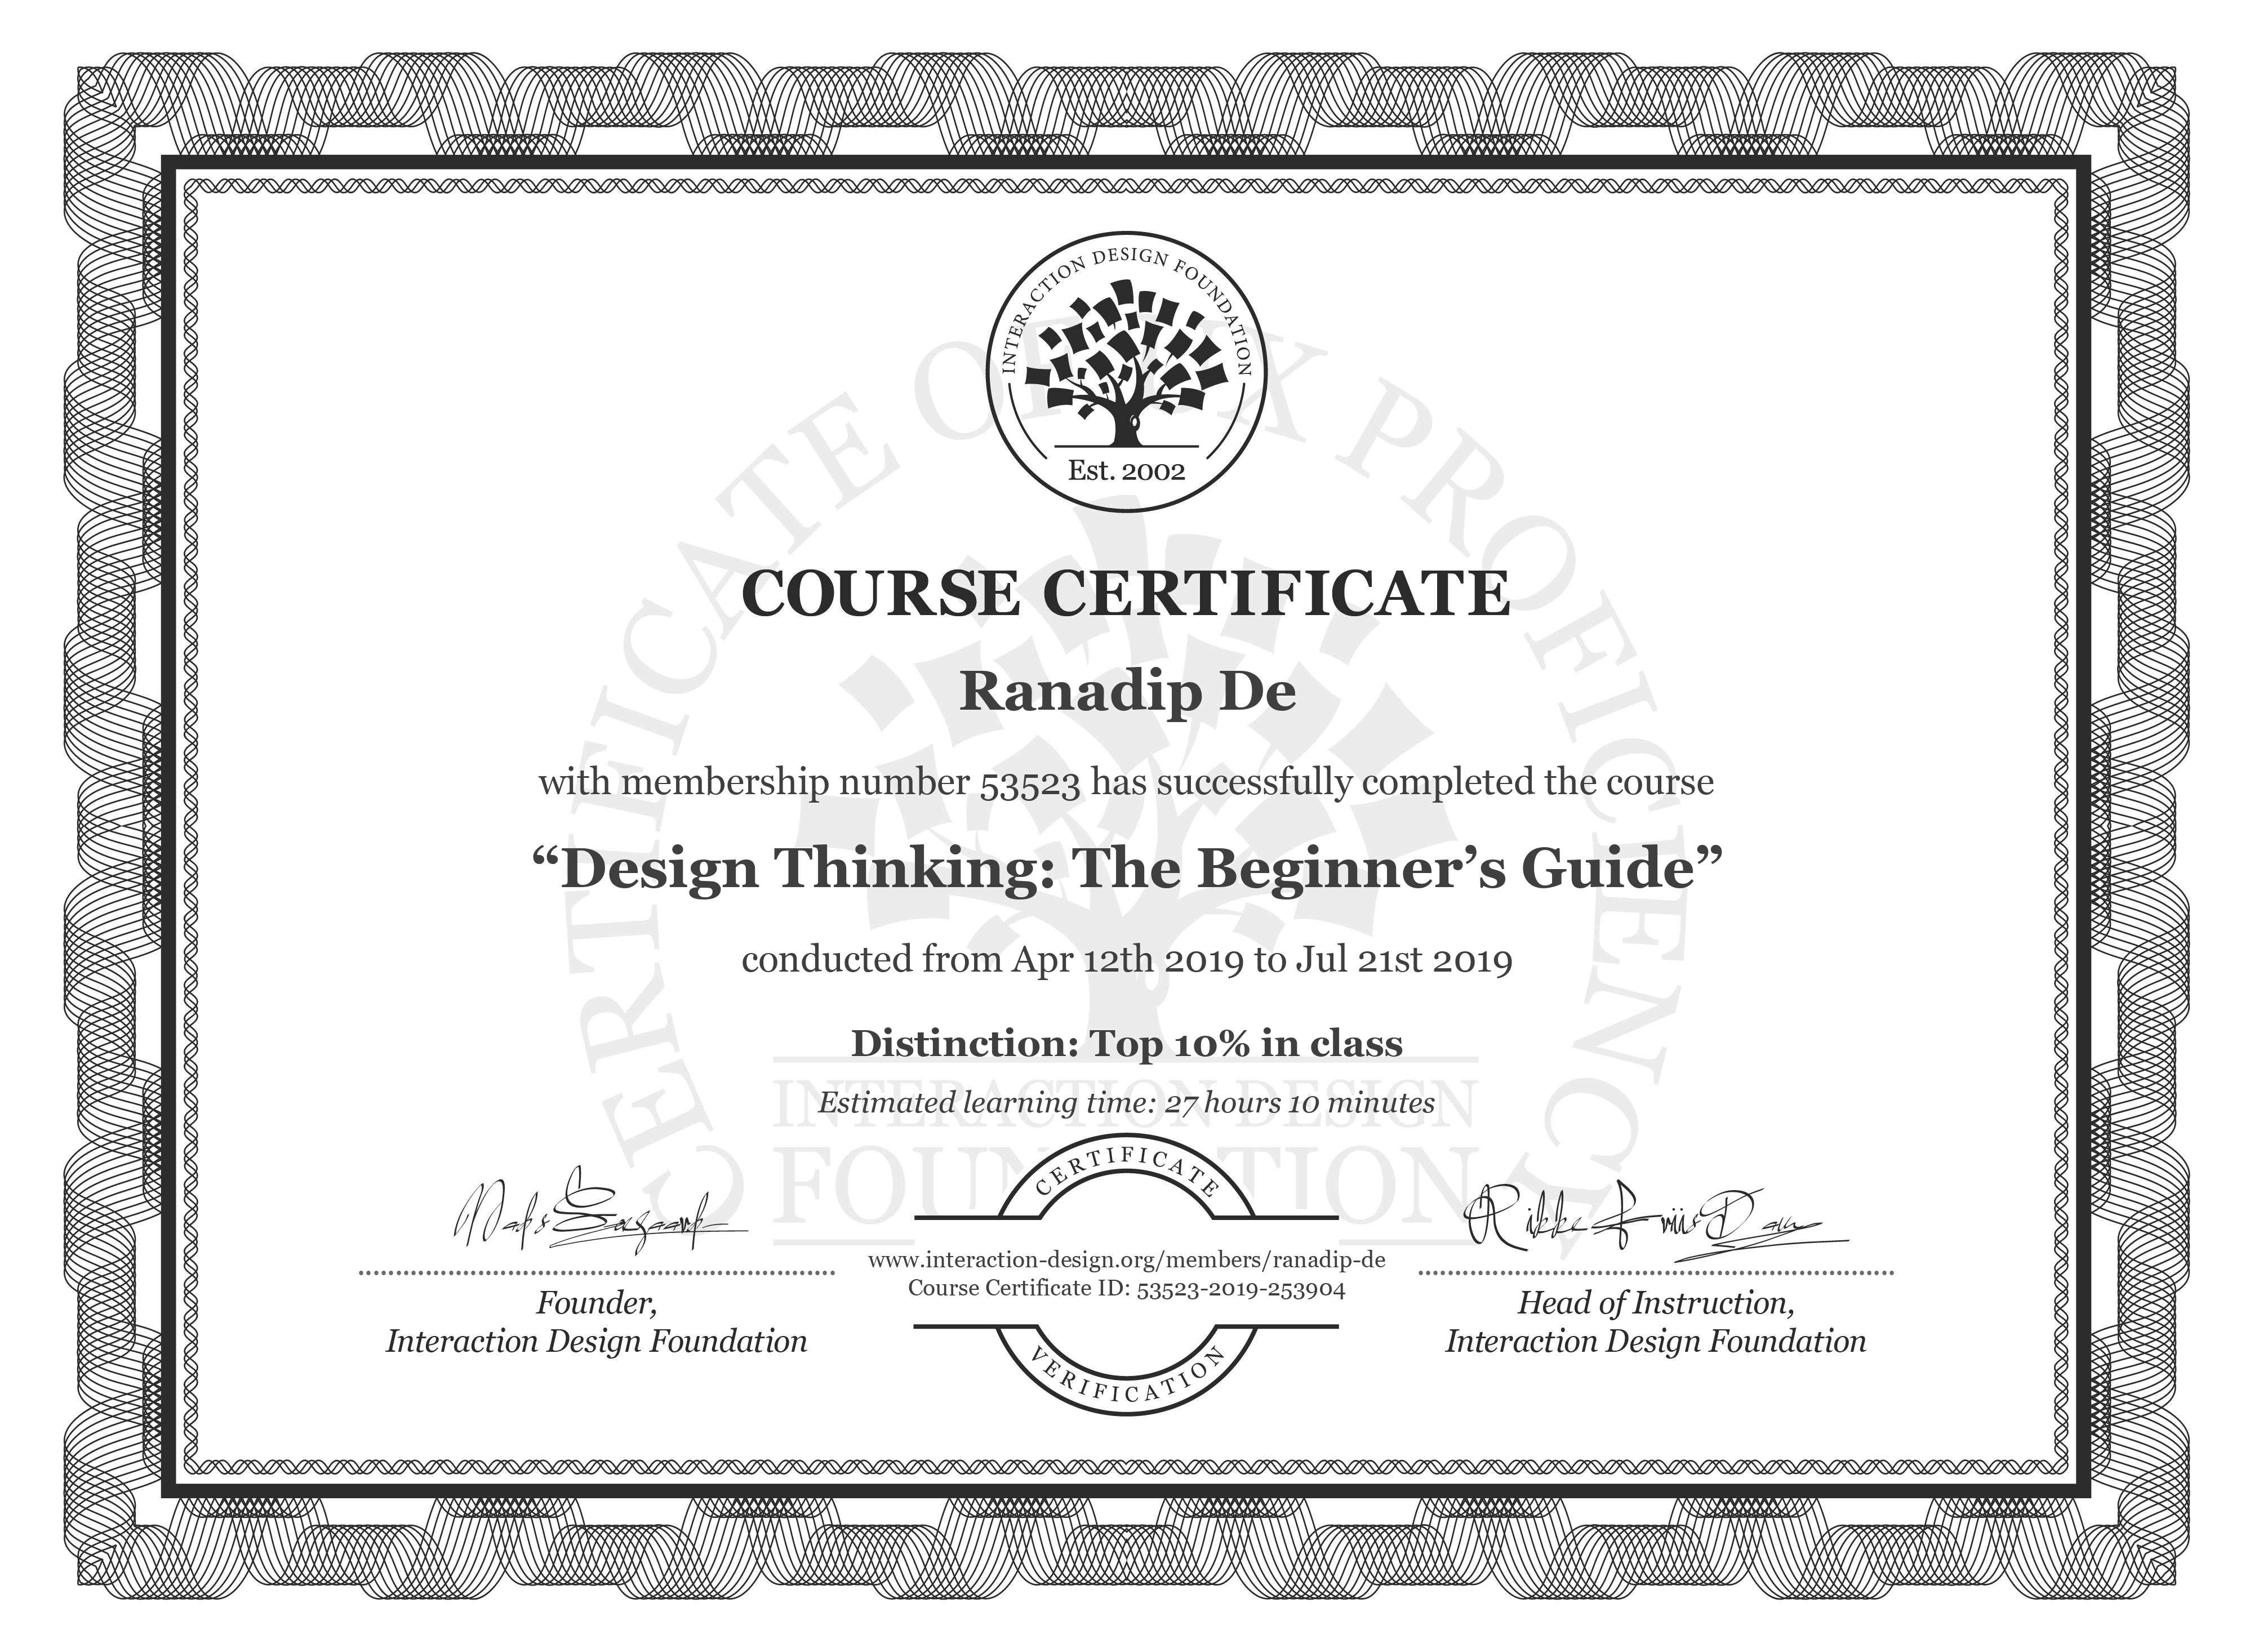 Ranadip De: Course Certificate - Design Thinking: The Beginner's Guide